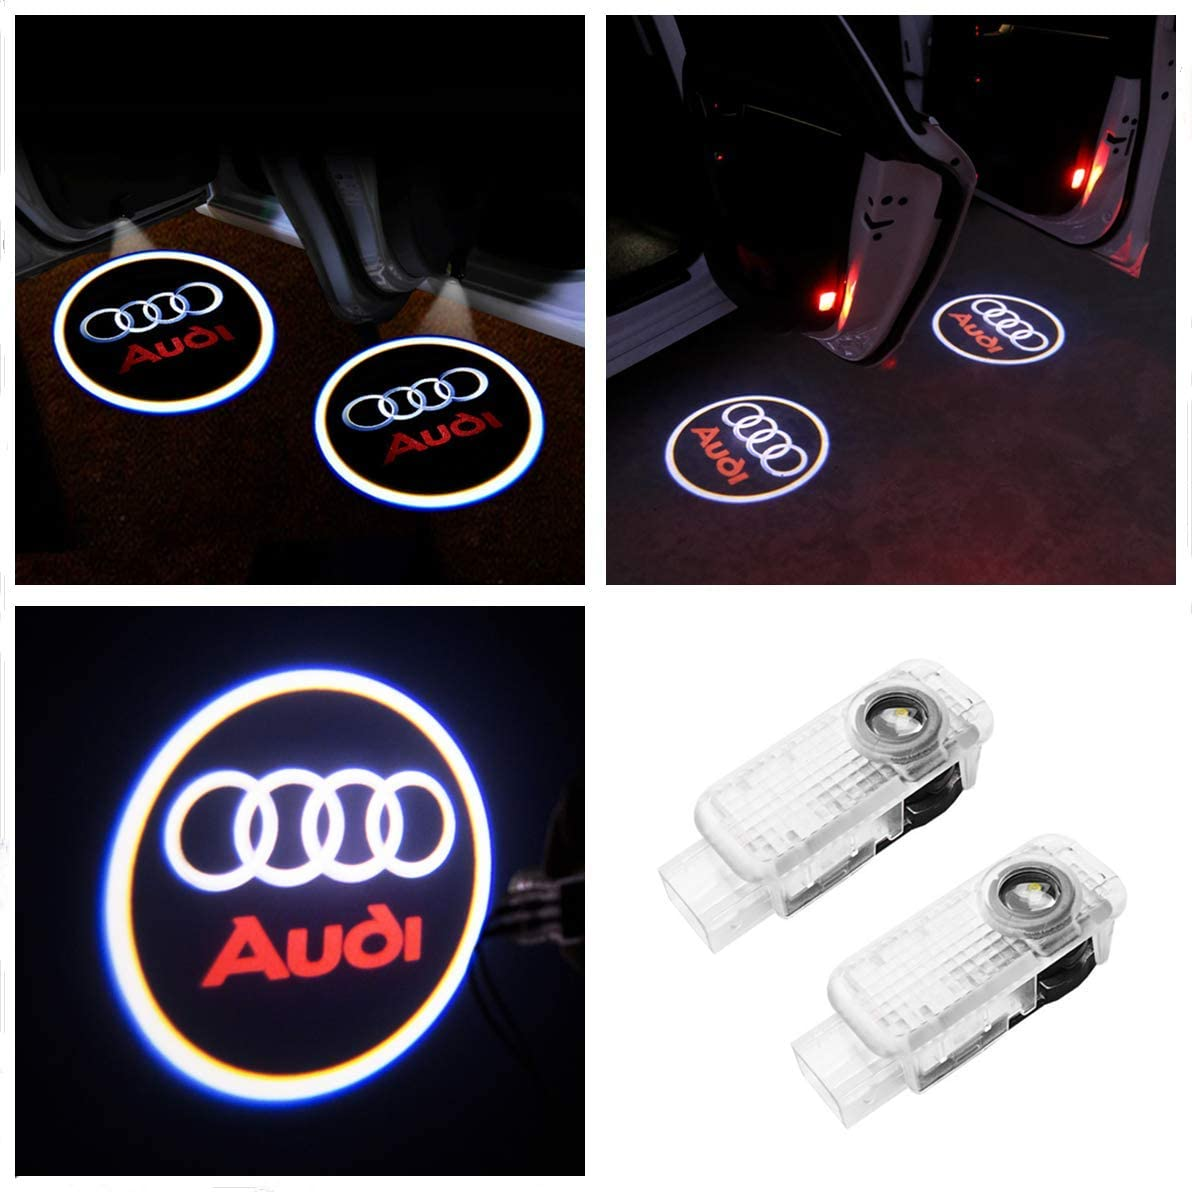 PRXD 2 piezas Puerta de coche Luz de logotipo LED Proyector láser Luces Fantasma Sombra Lámpara de bienvenida Luz de cortesía, Para A1 A3 A4 A6 A8, R8 TT Q7 Q5, etc